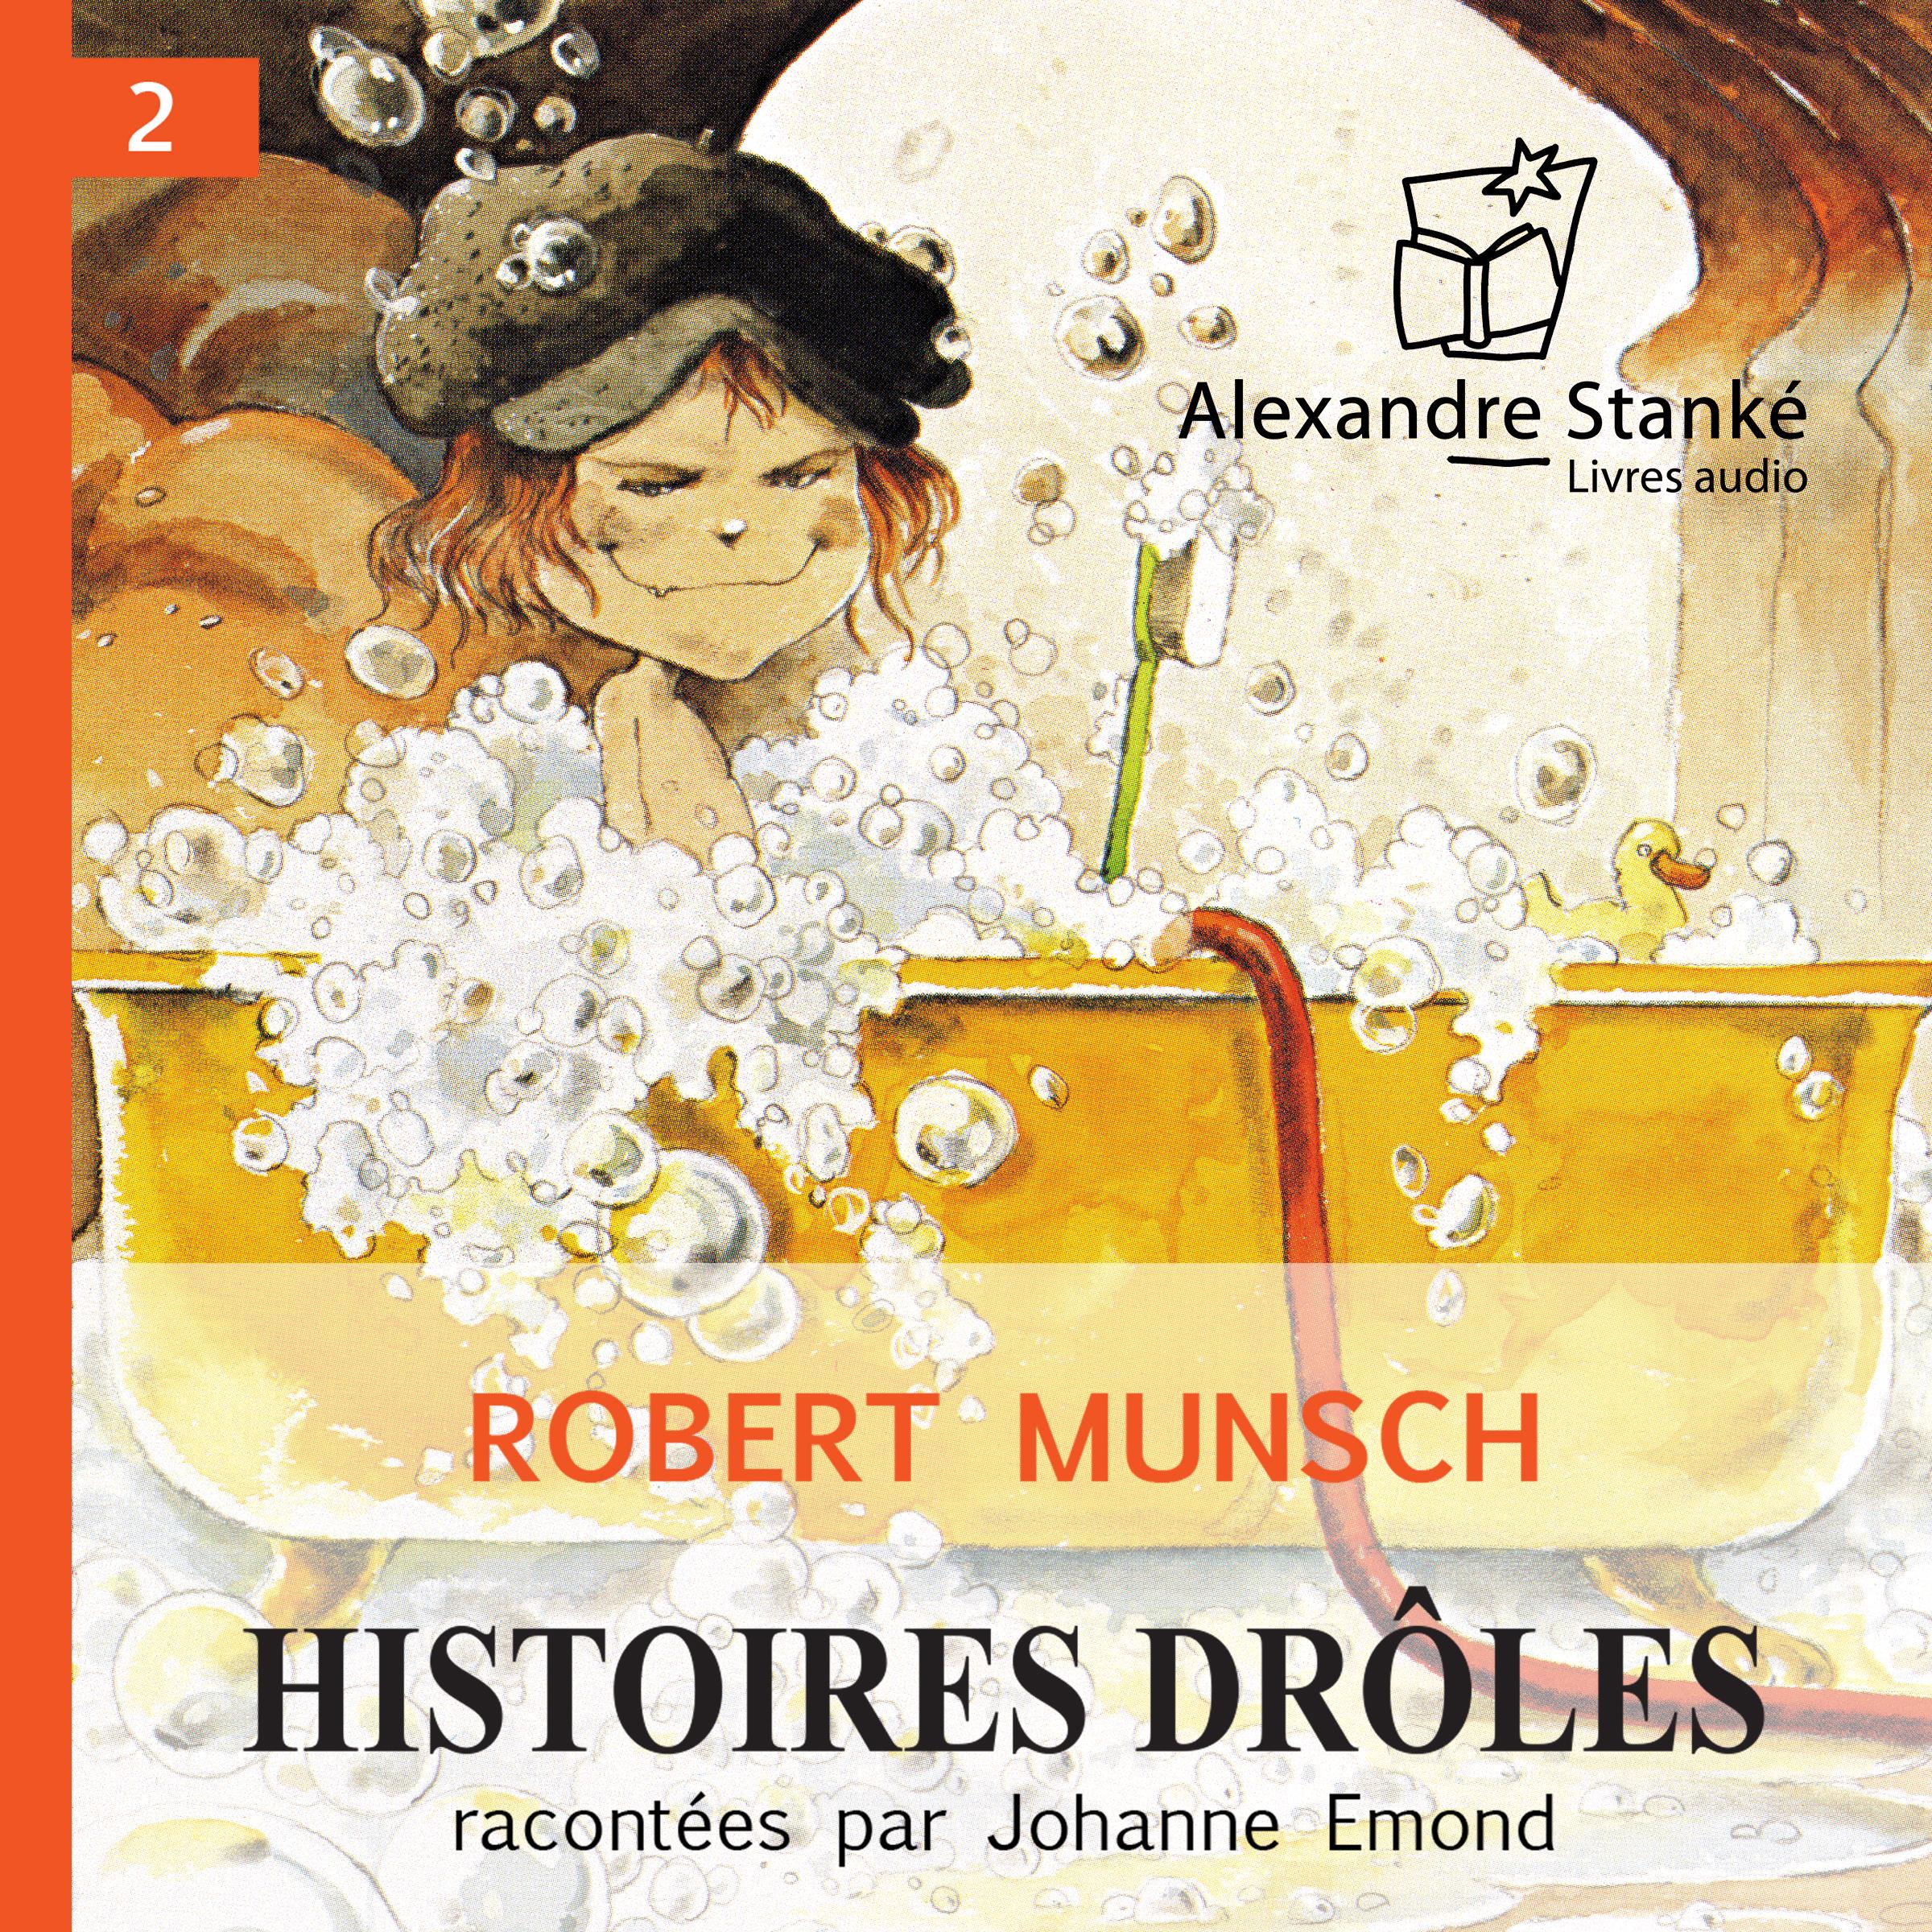 Histoires drôles vol. 2